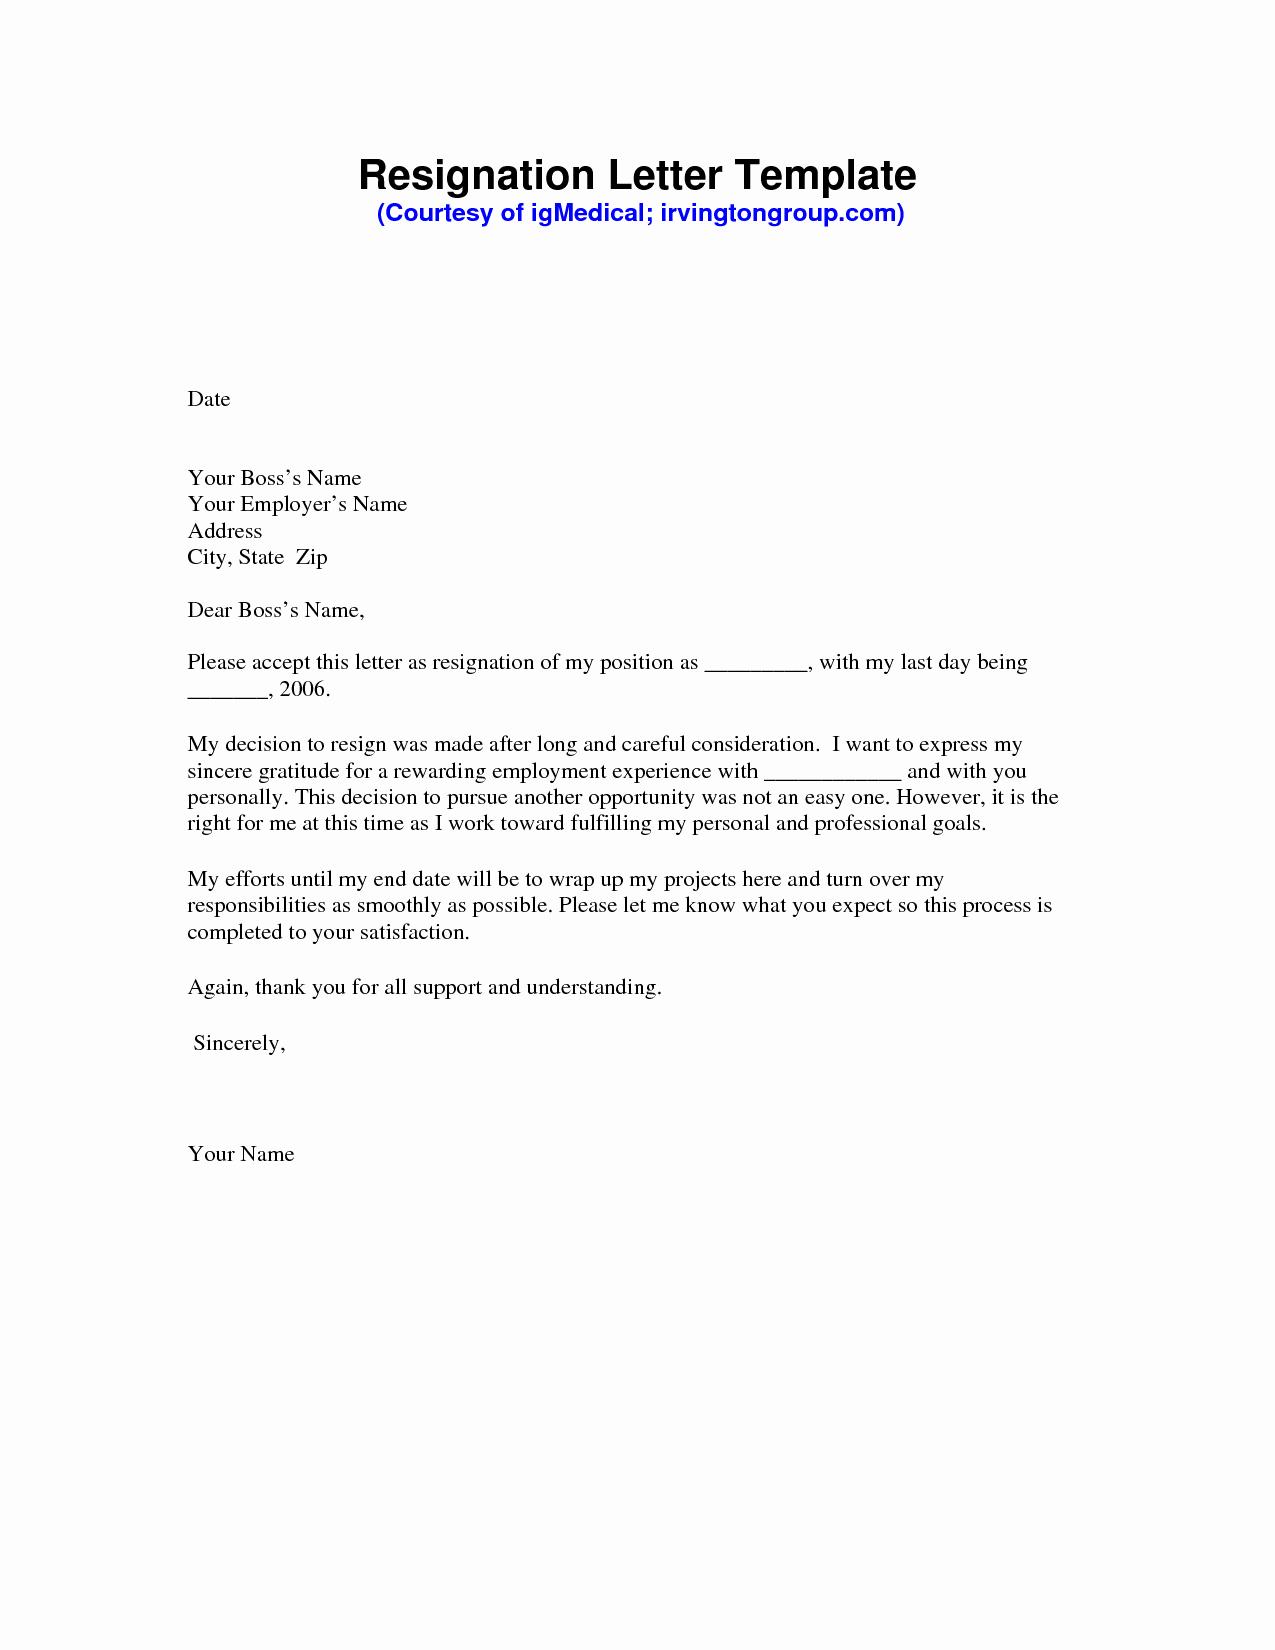 Professional Resignation Letter Sample Elegant Resignation Letter Sample Pdf